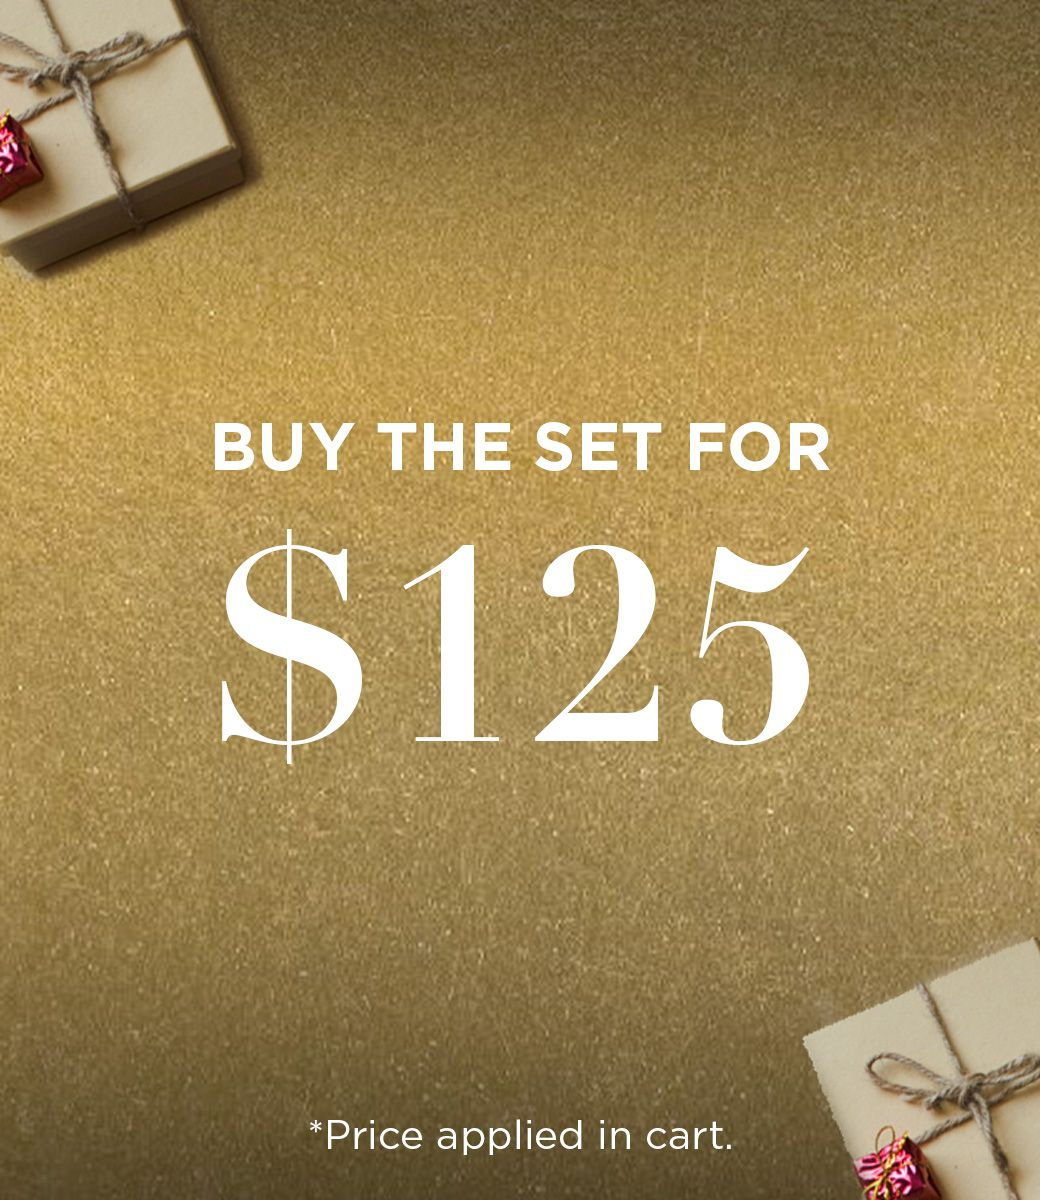 New Balance CA Women Gift Bundle $125,